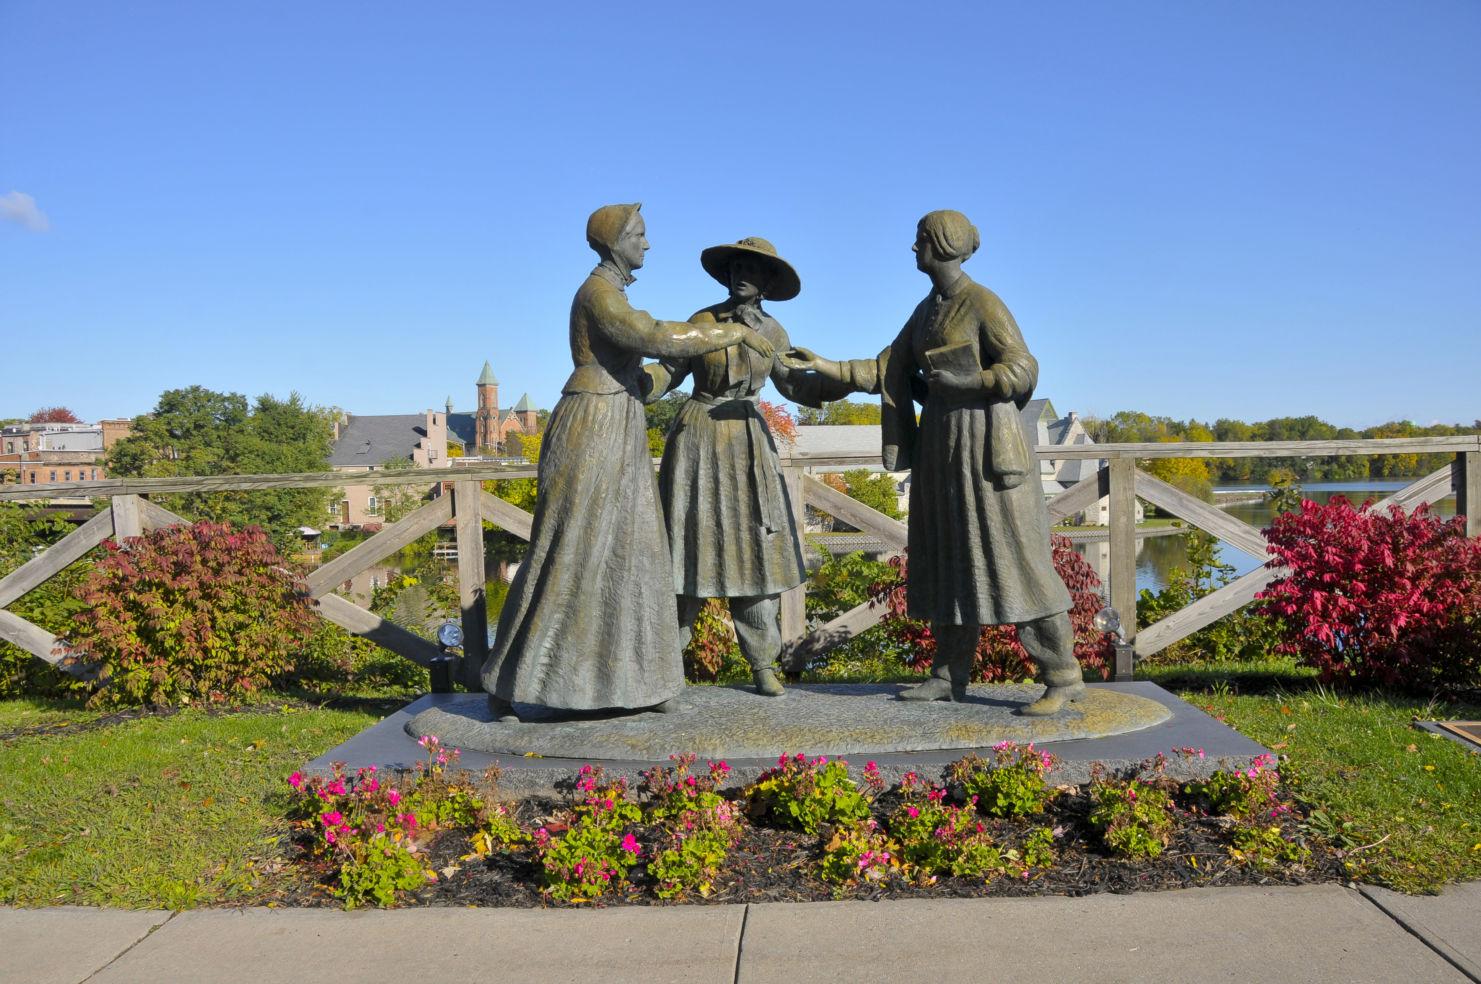 Statue of Susan B. Anthony, Amelia Bloomer and Elizabeth Cady Stanton, Seneca Falls, New York